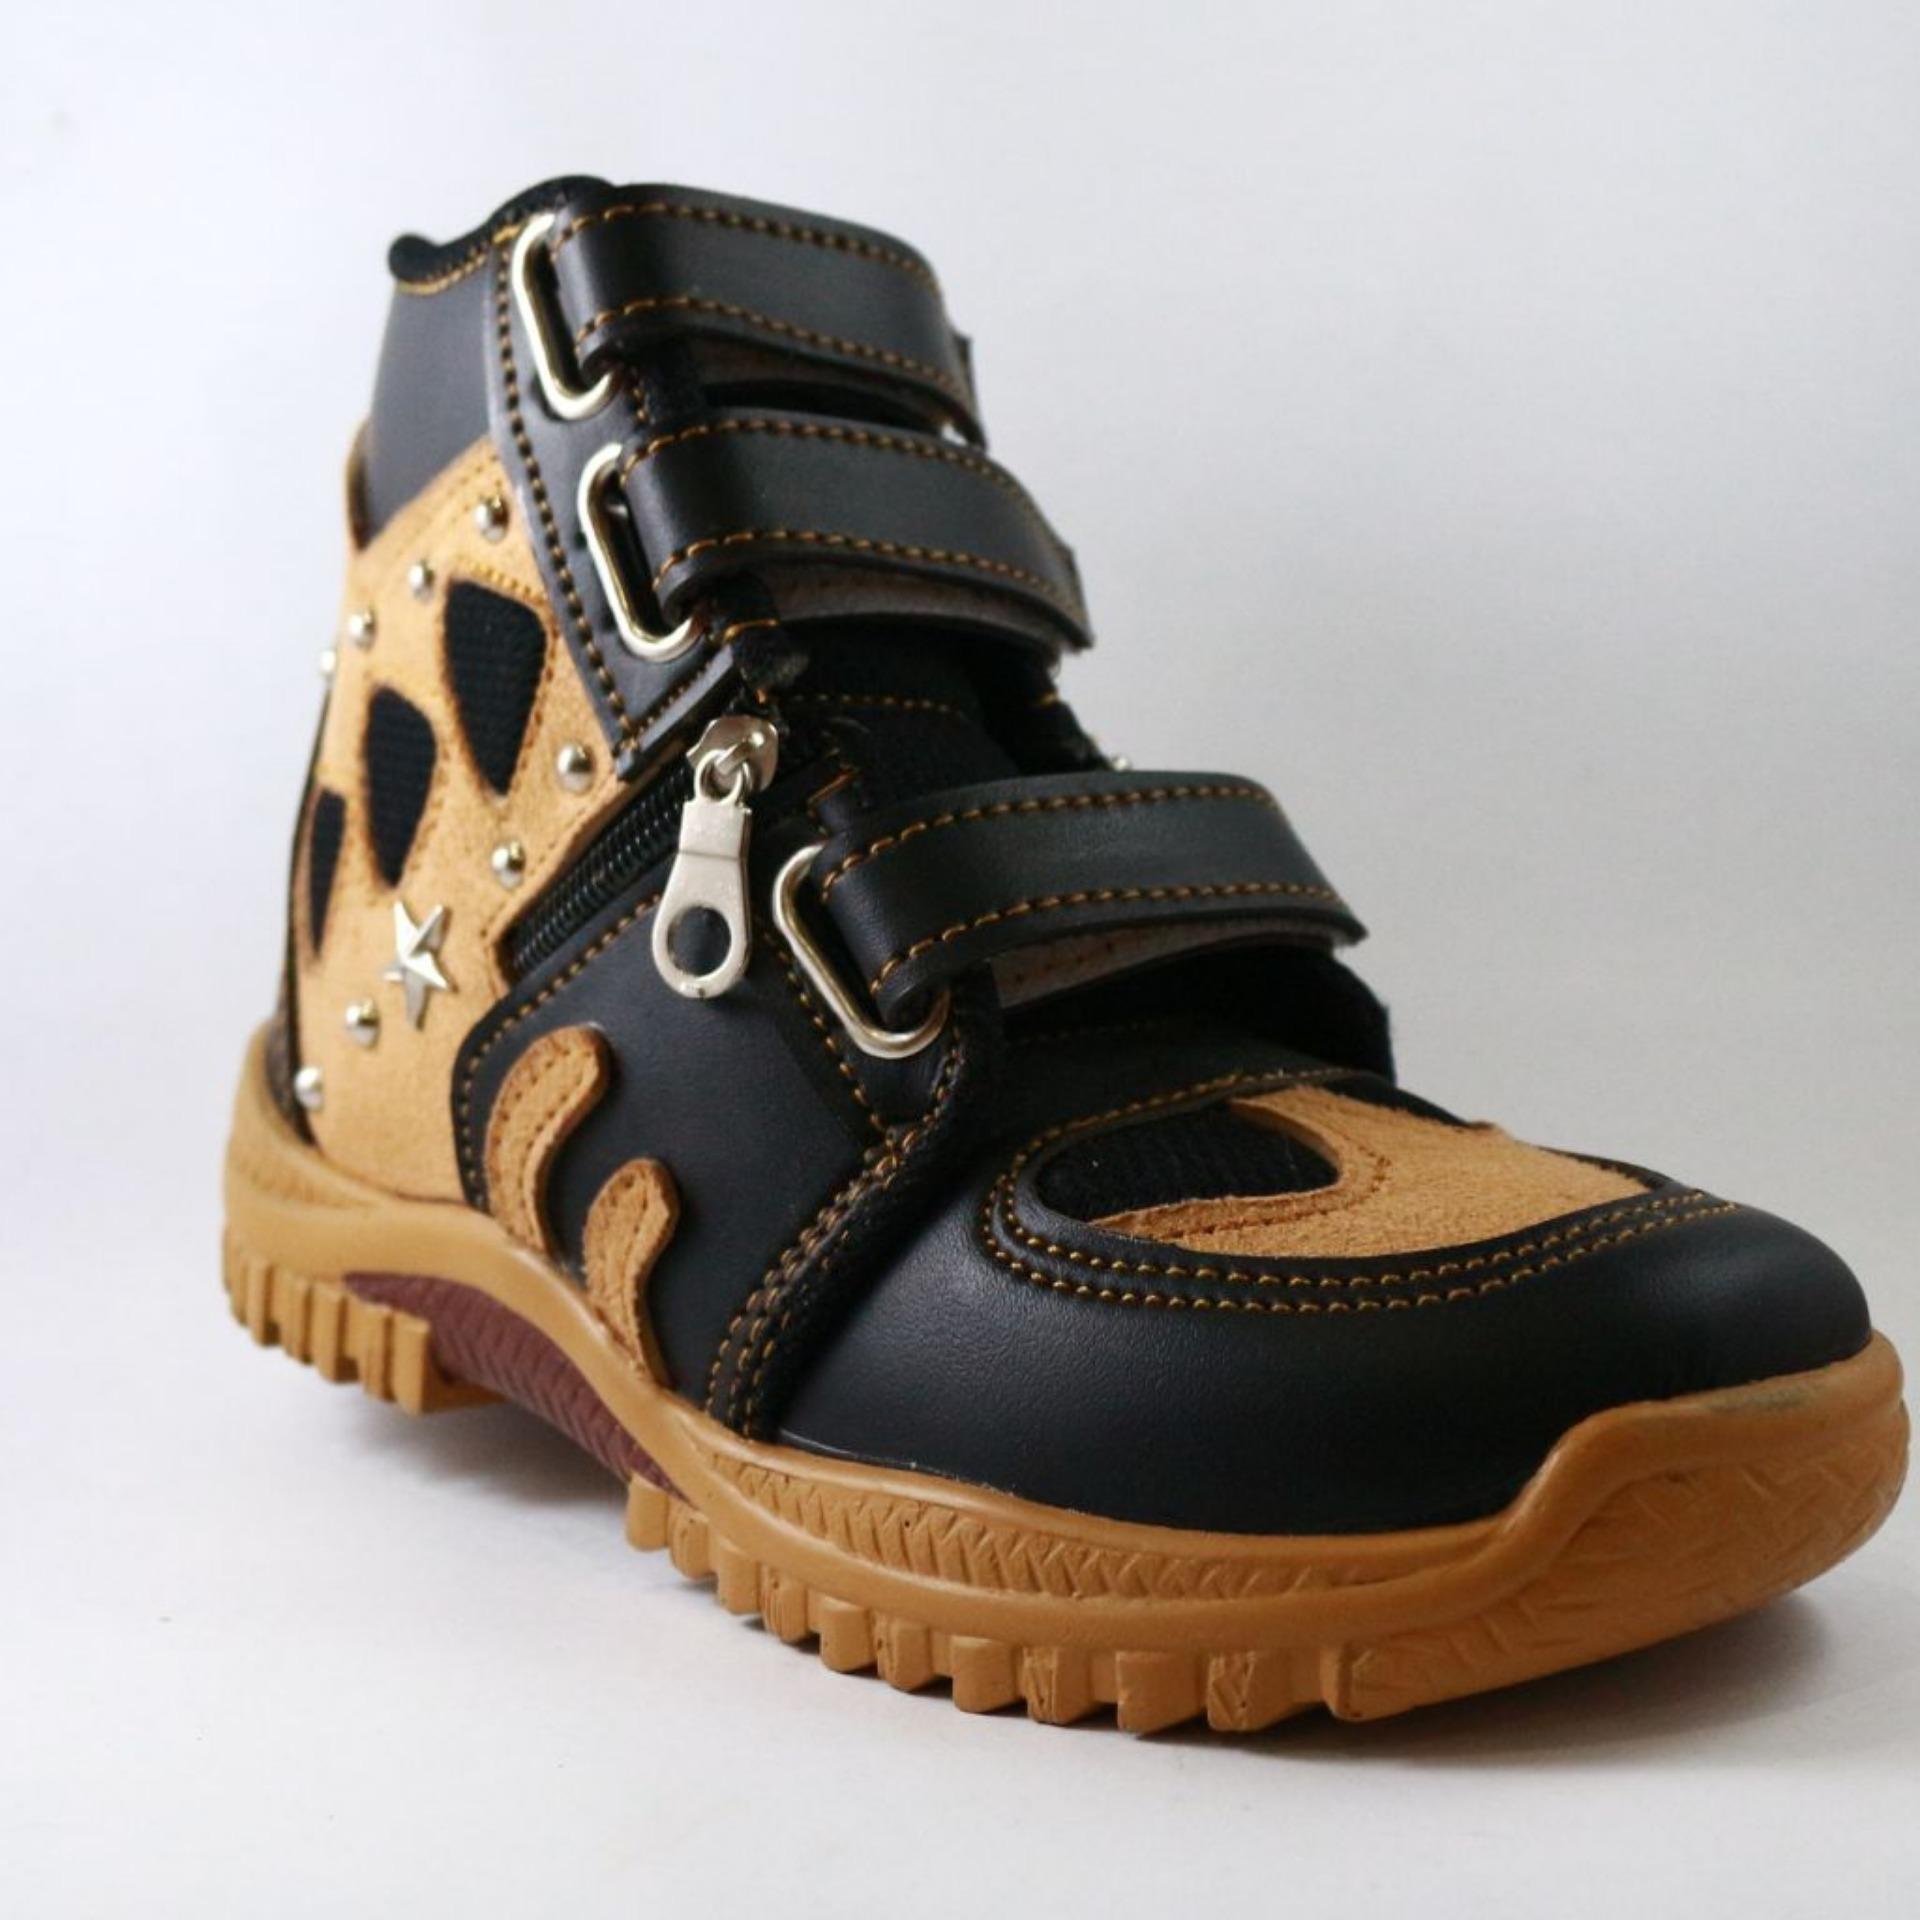 Beli Sepatu Boot Anak Cowo Keren Kredit